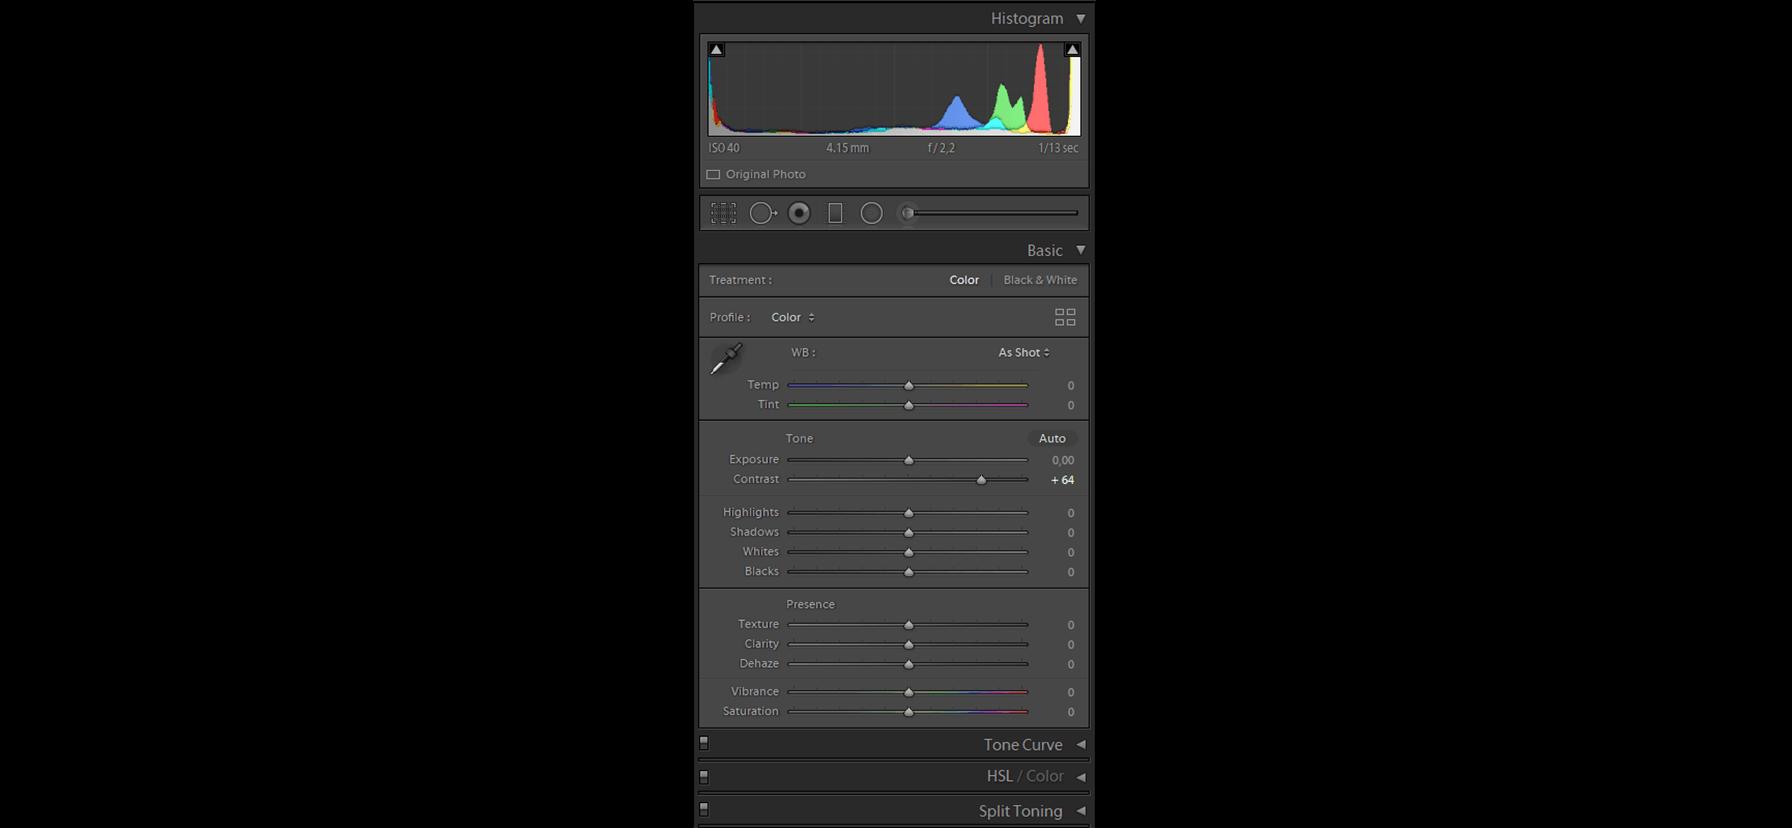 histogram w Adobe Lightroom